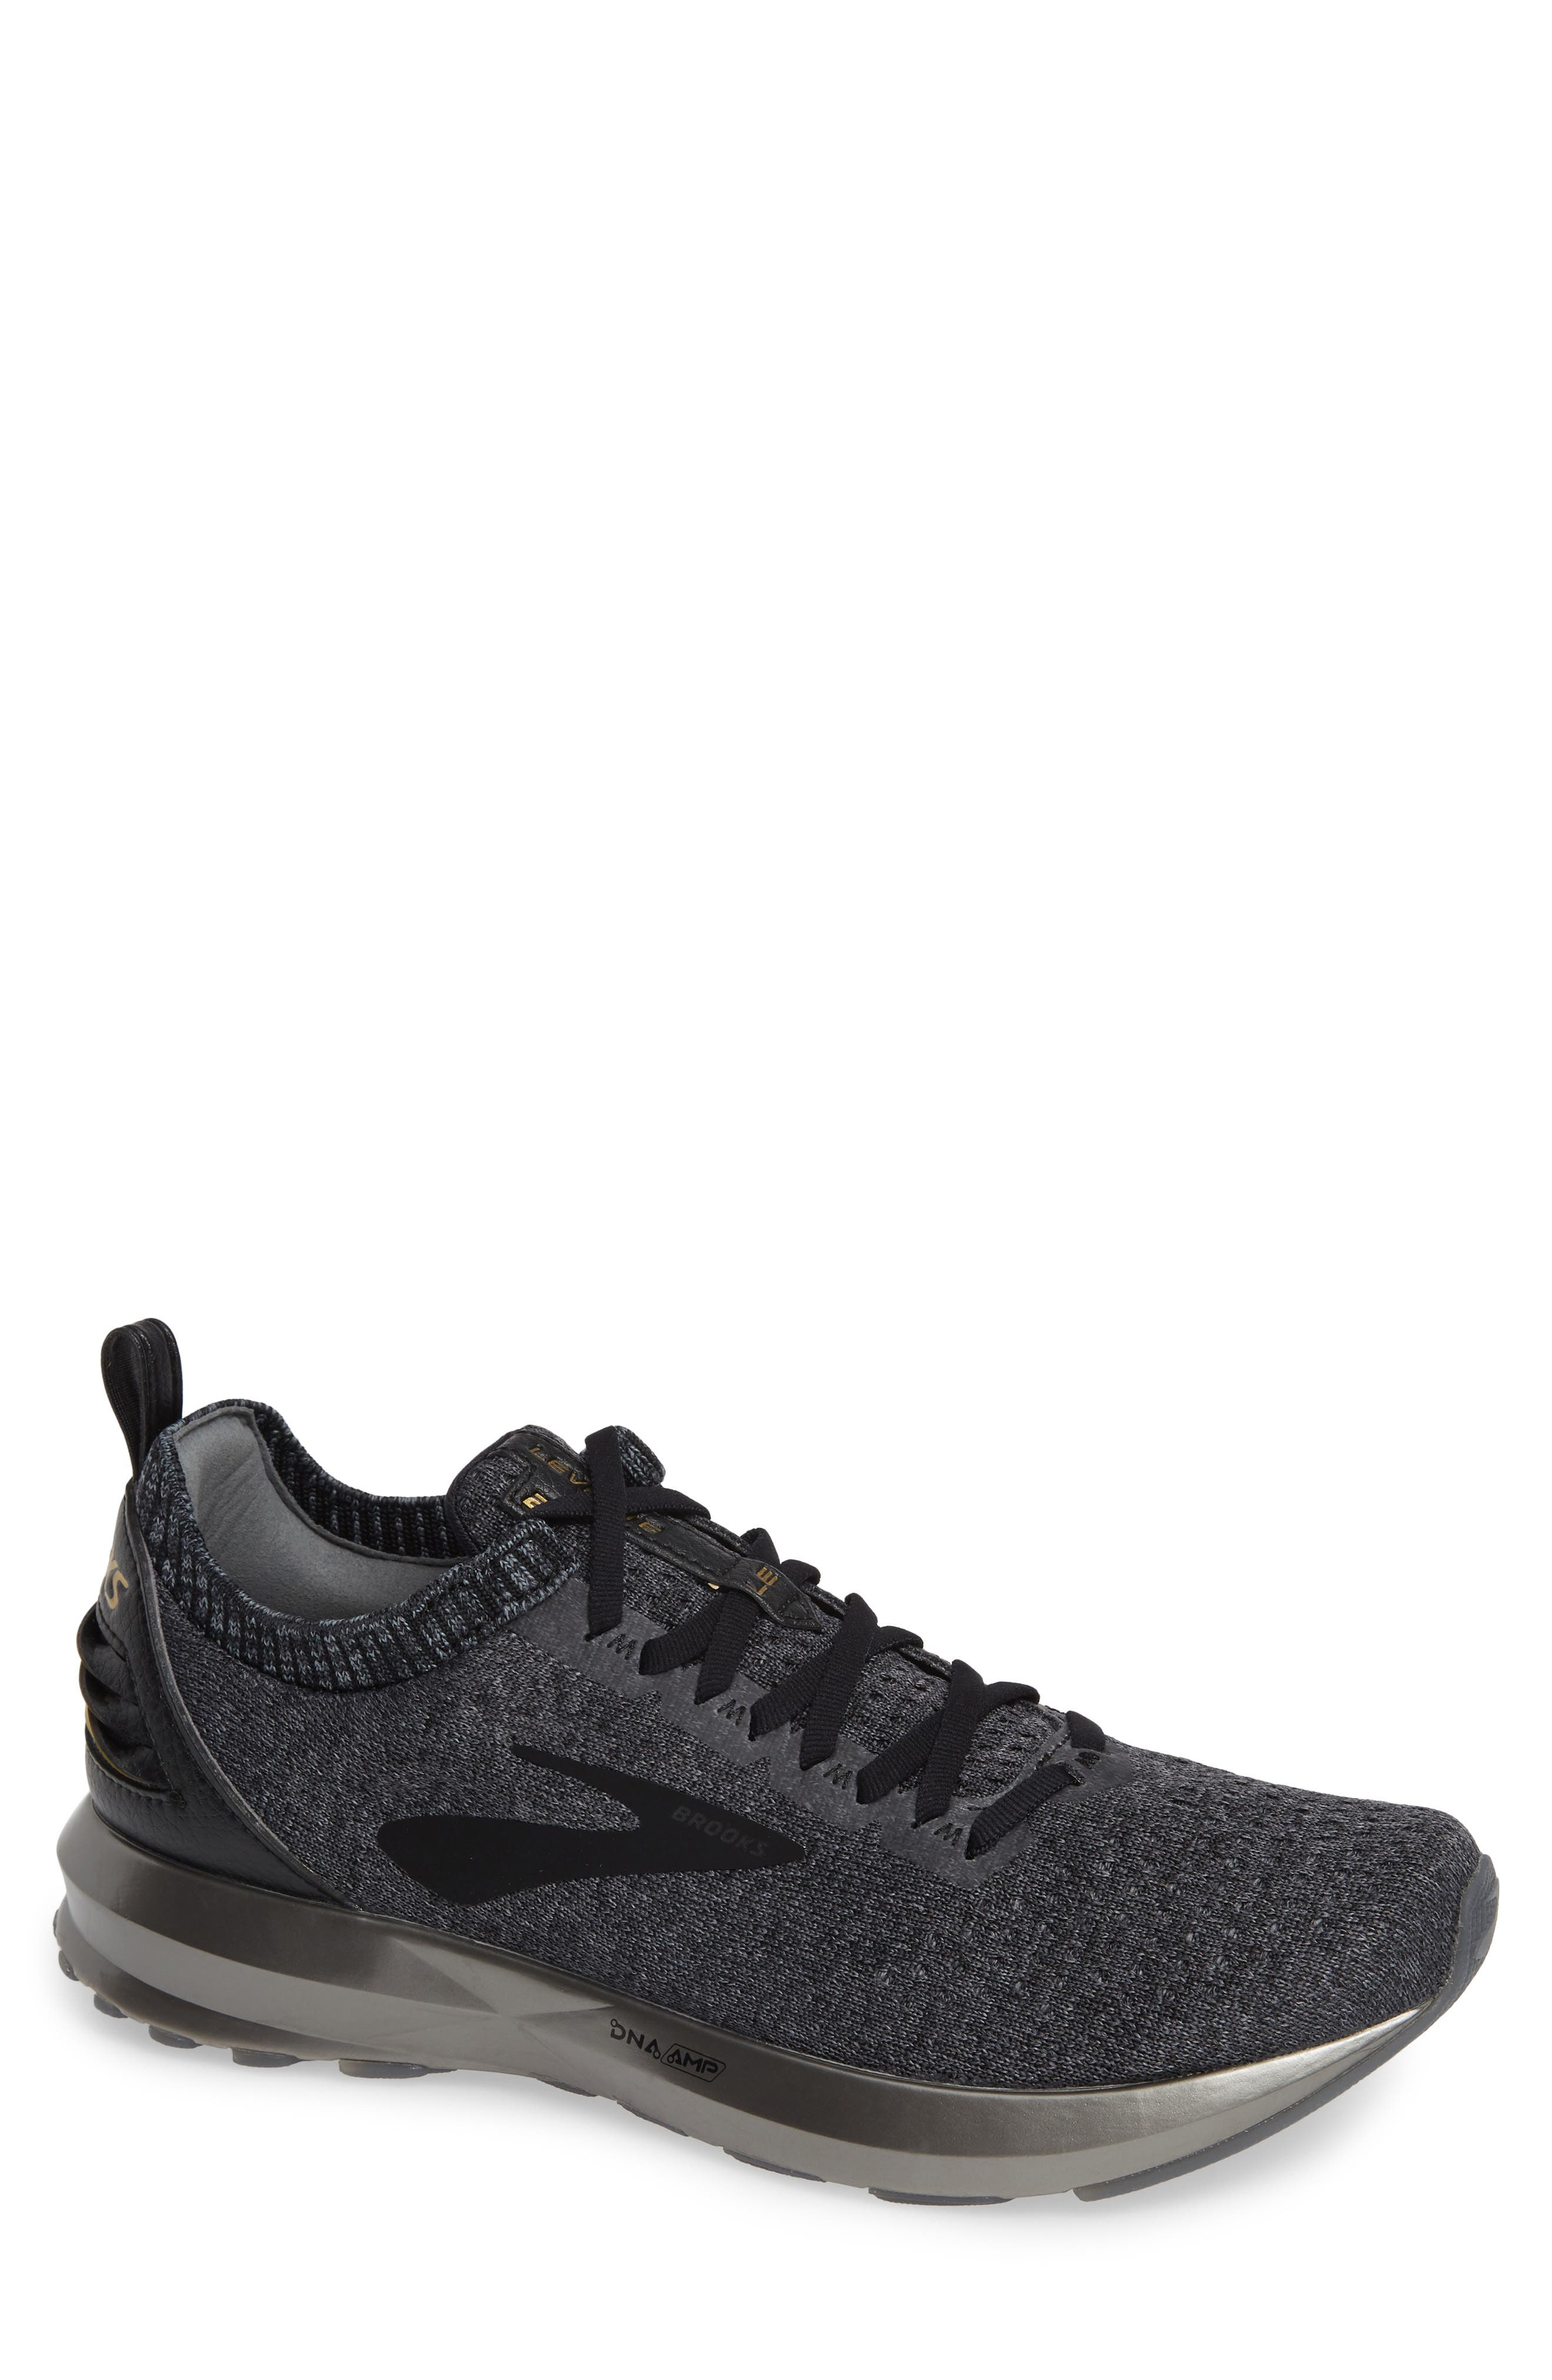 Levitate 2 LE Running Shoe, Main, color, BLACK/ GREY/ GOLD